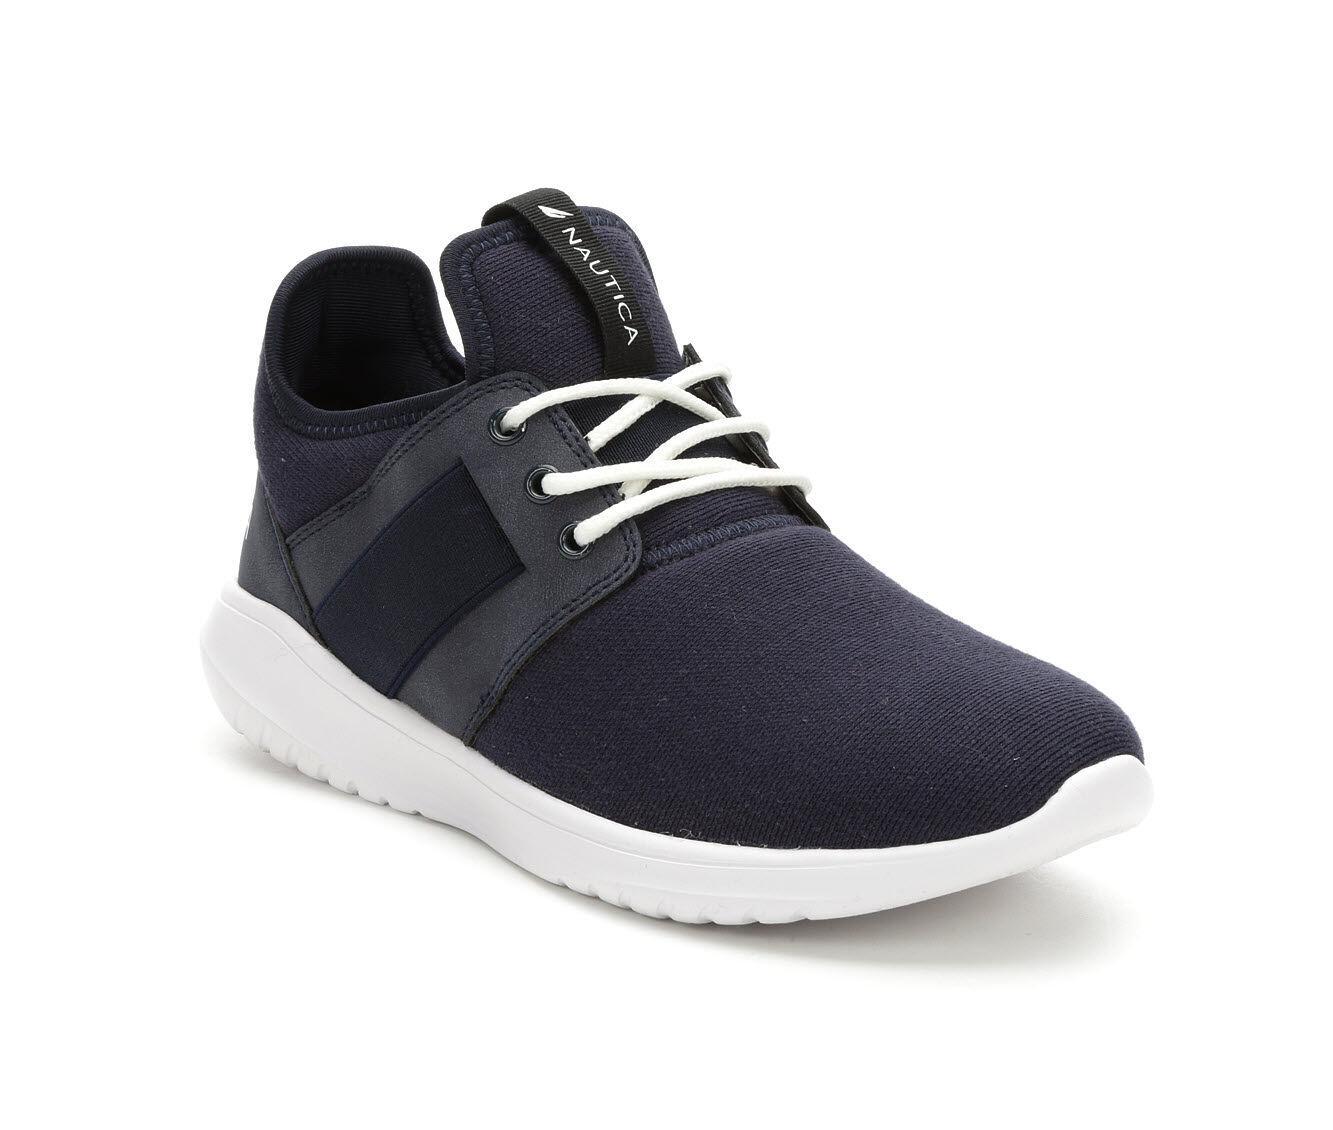 Nautica Primage Heathered Shoe in Blue